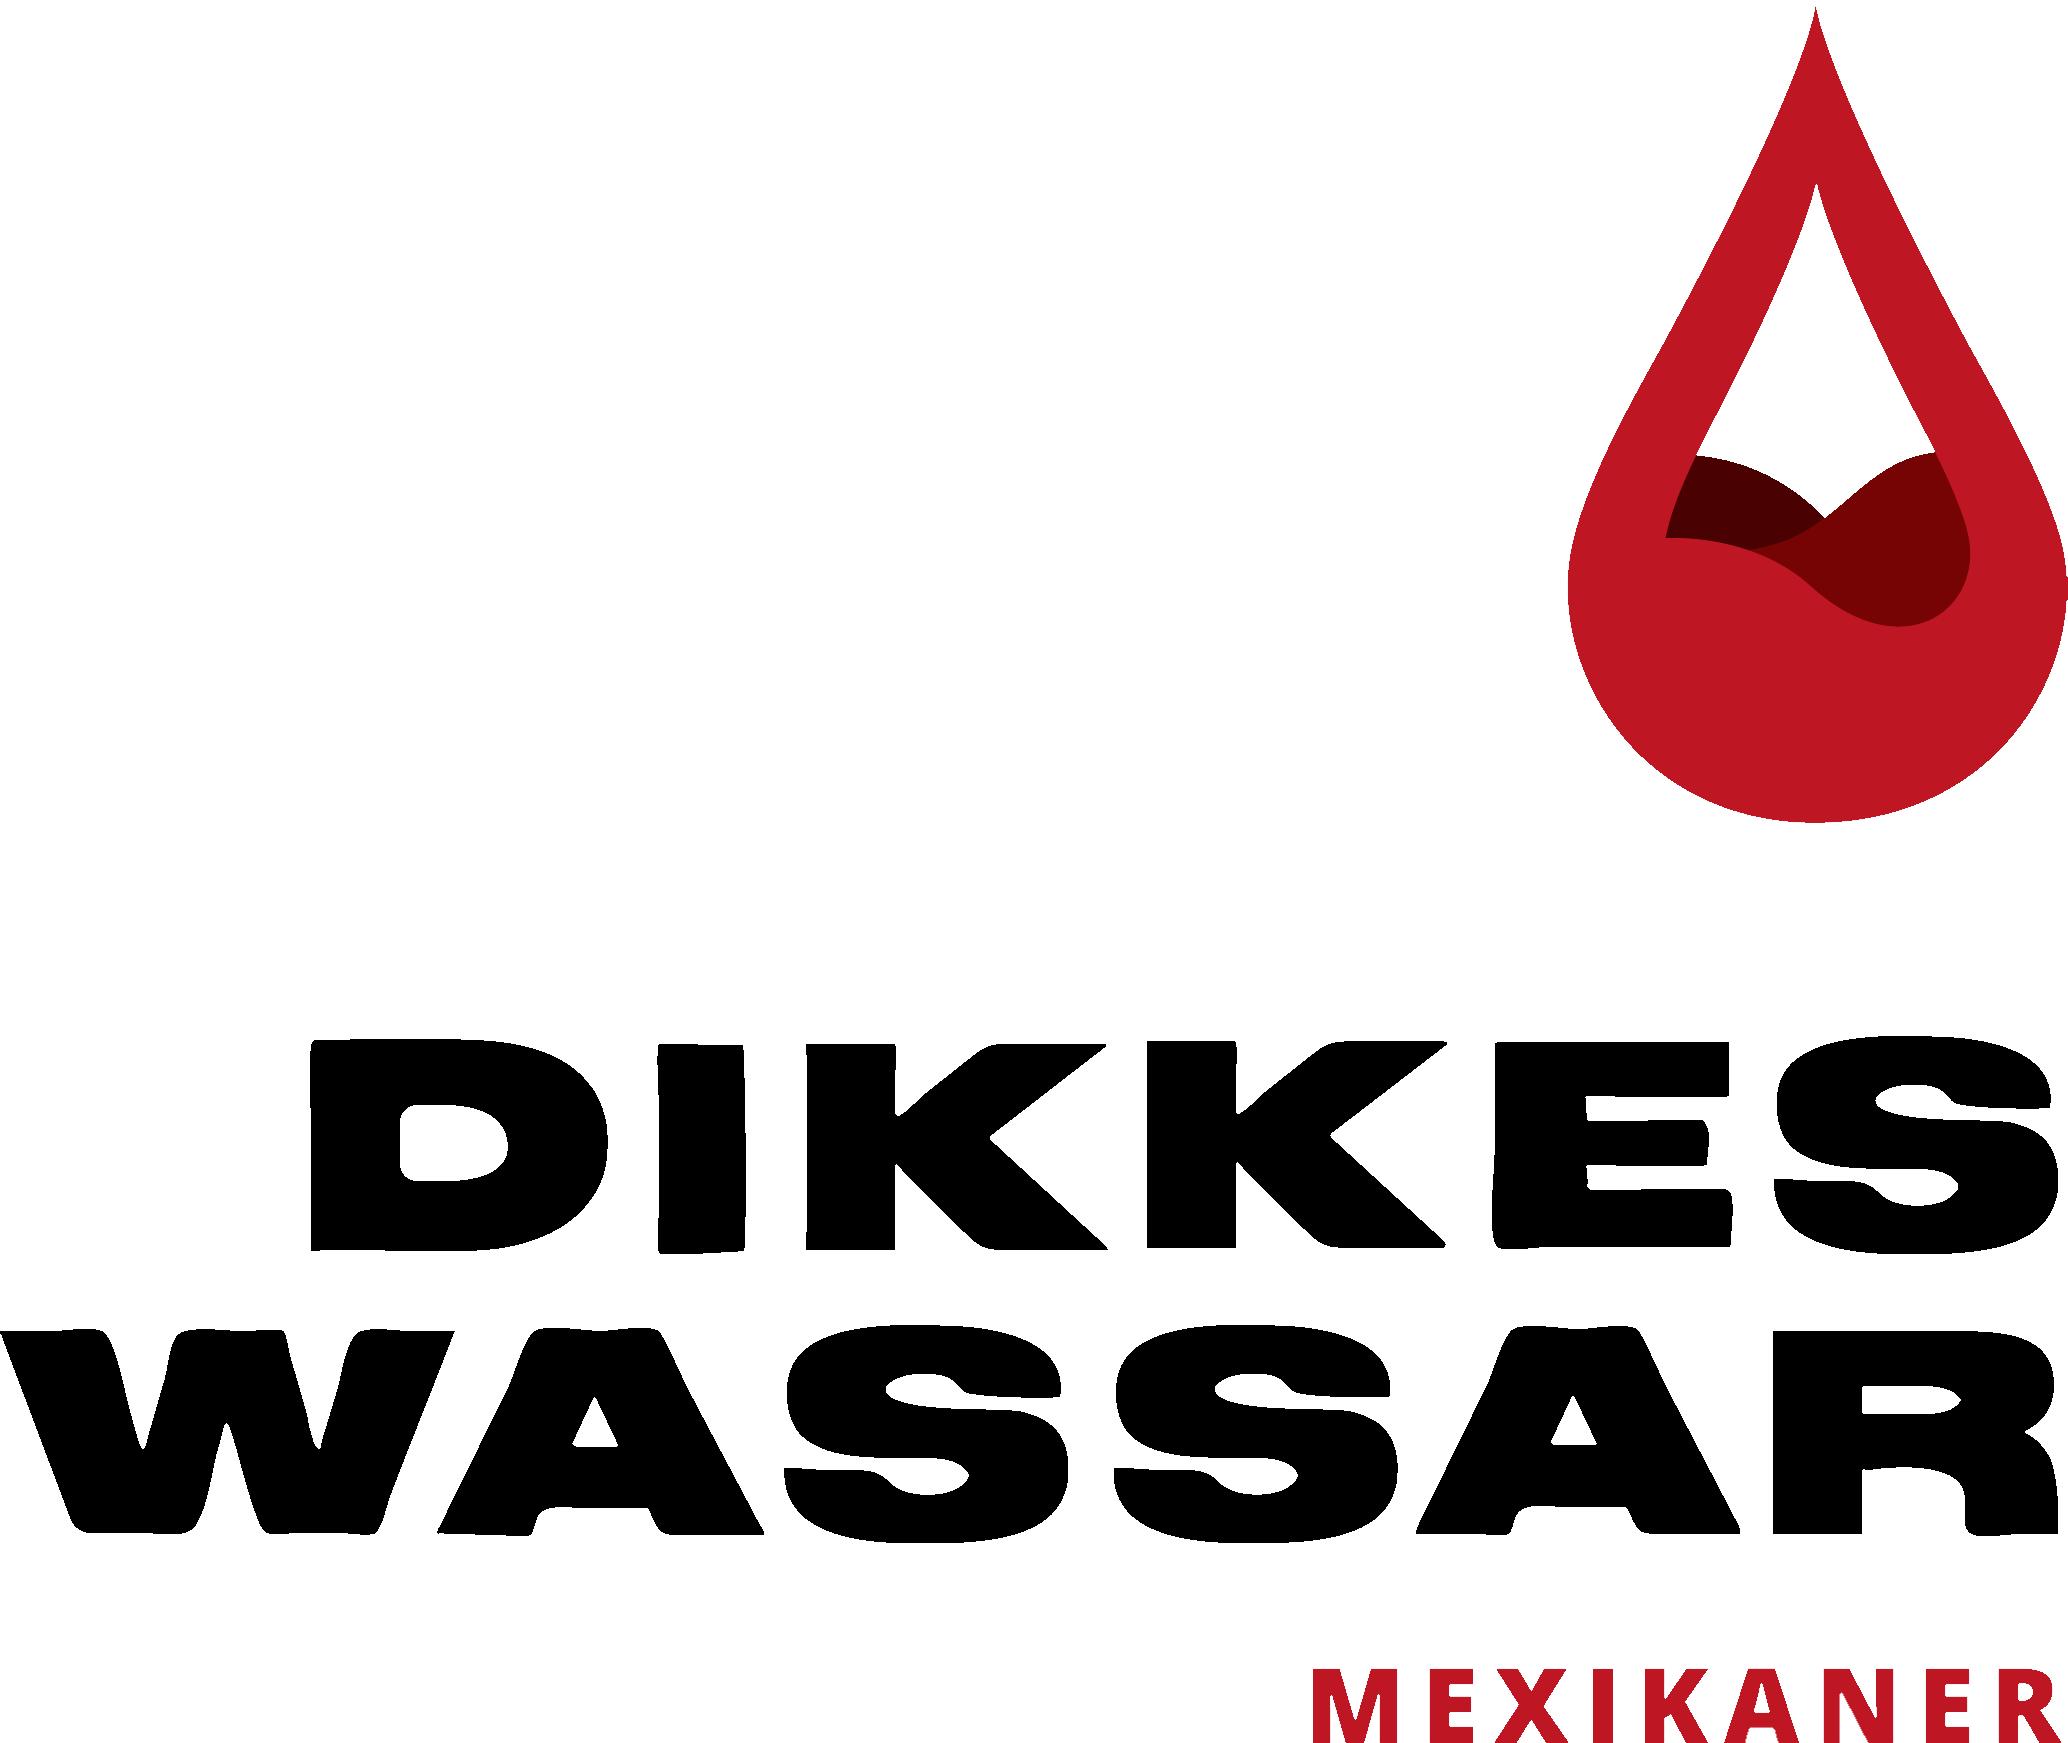 DIKKES WASSAR Mexikaner Logo